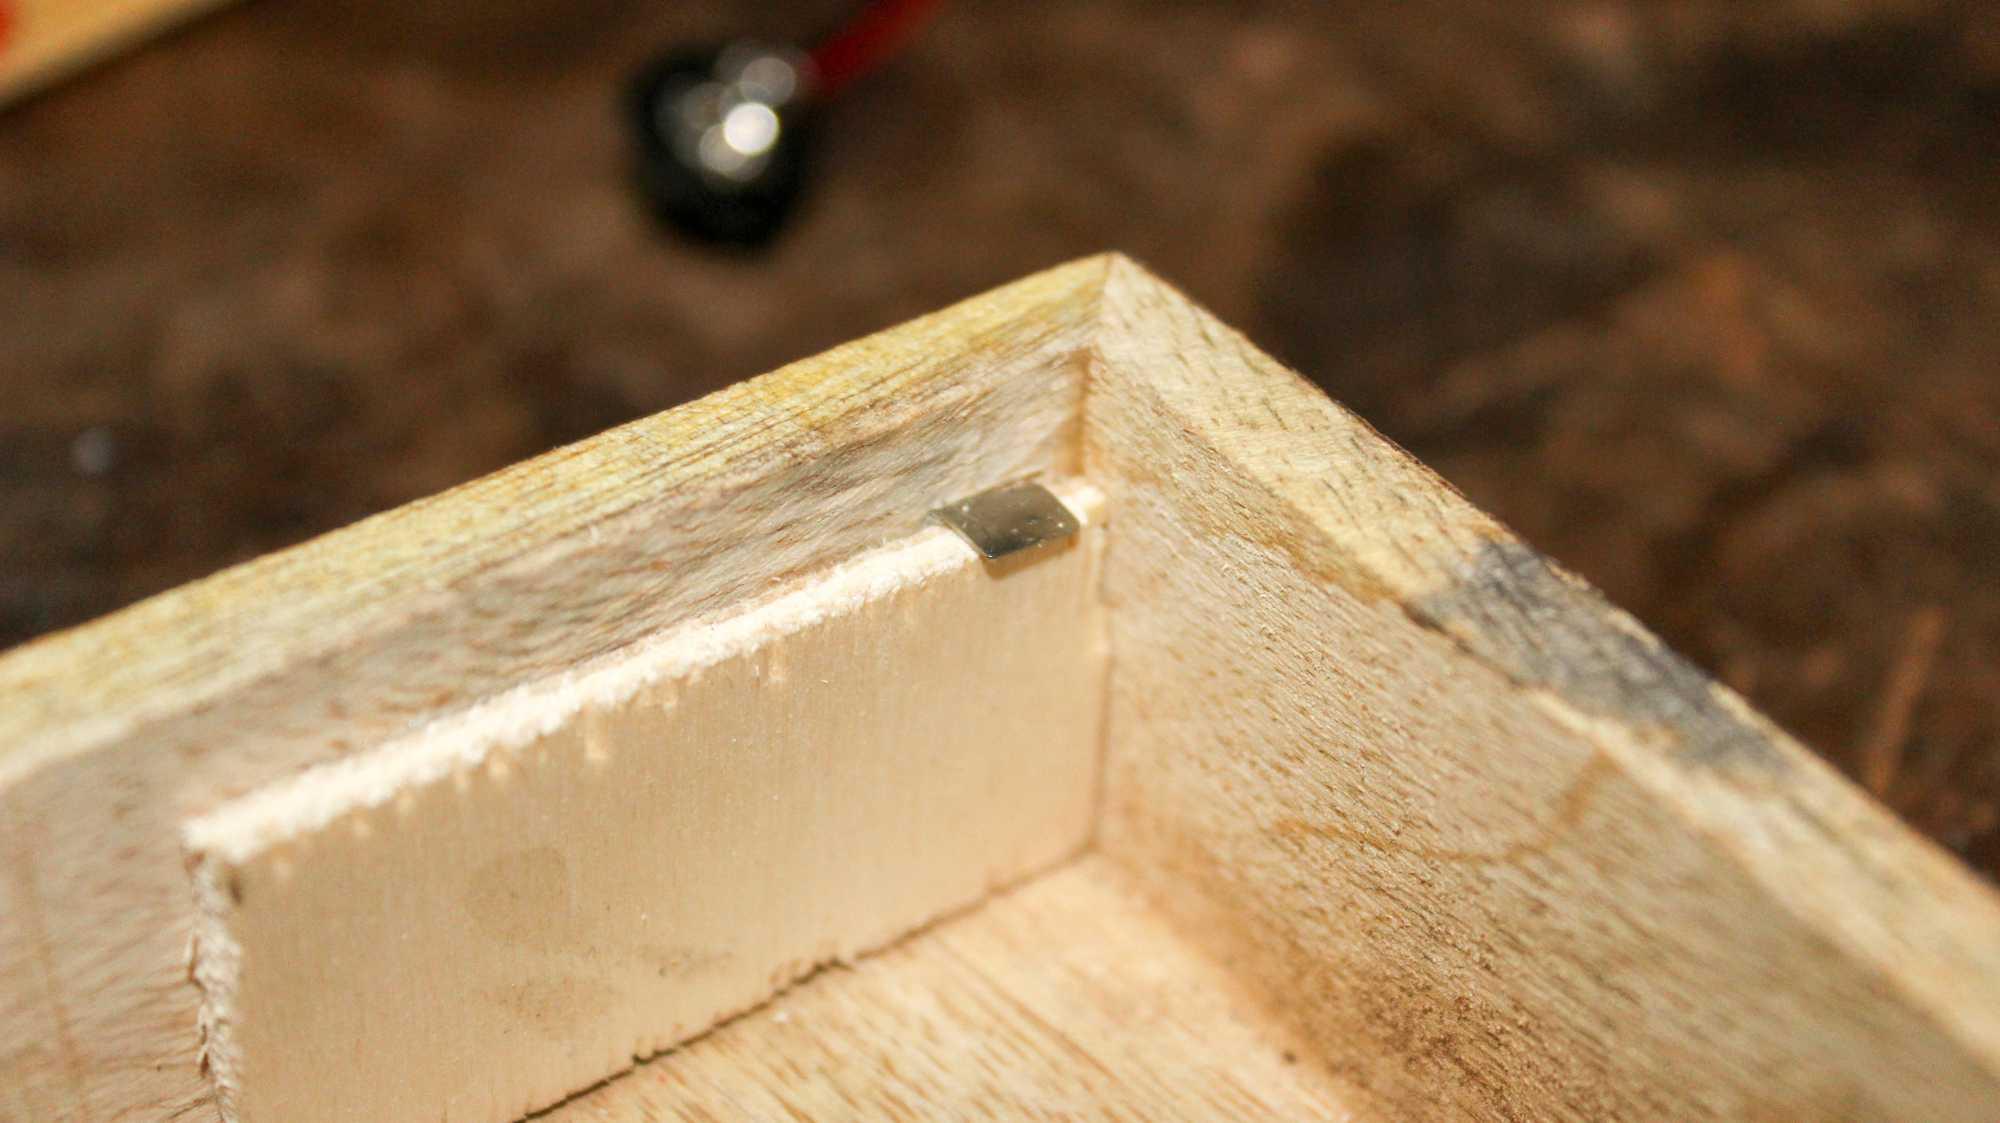 Holzleiste mit Magnet des Audio-Adventskalenders